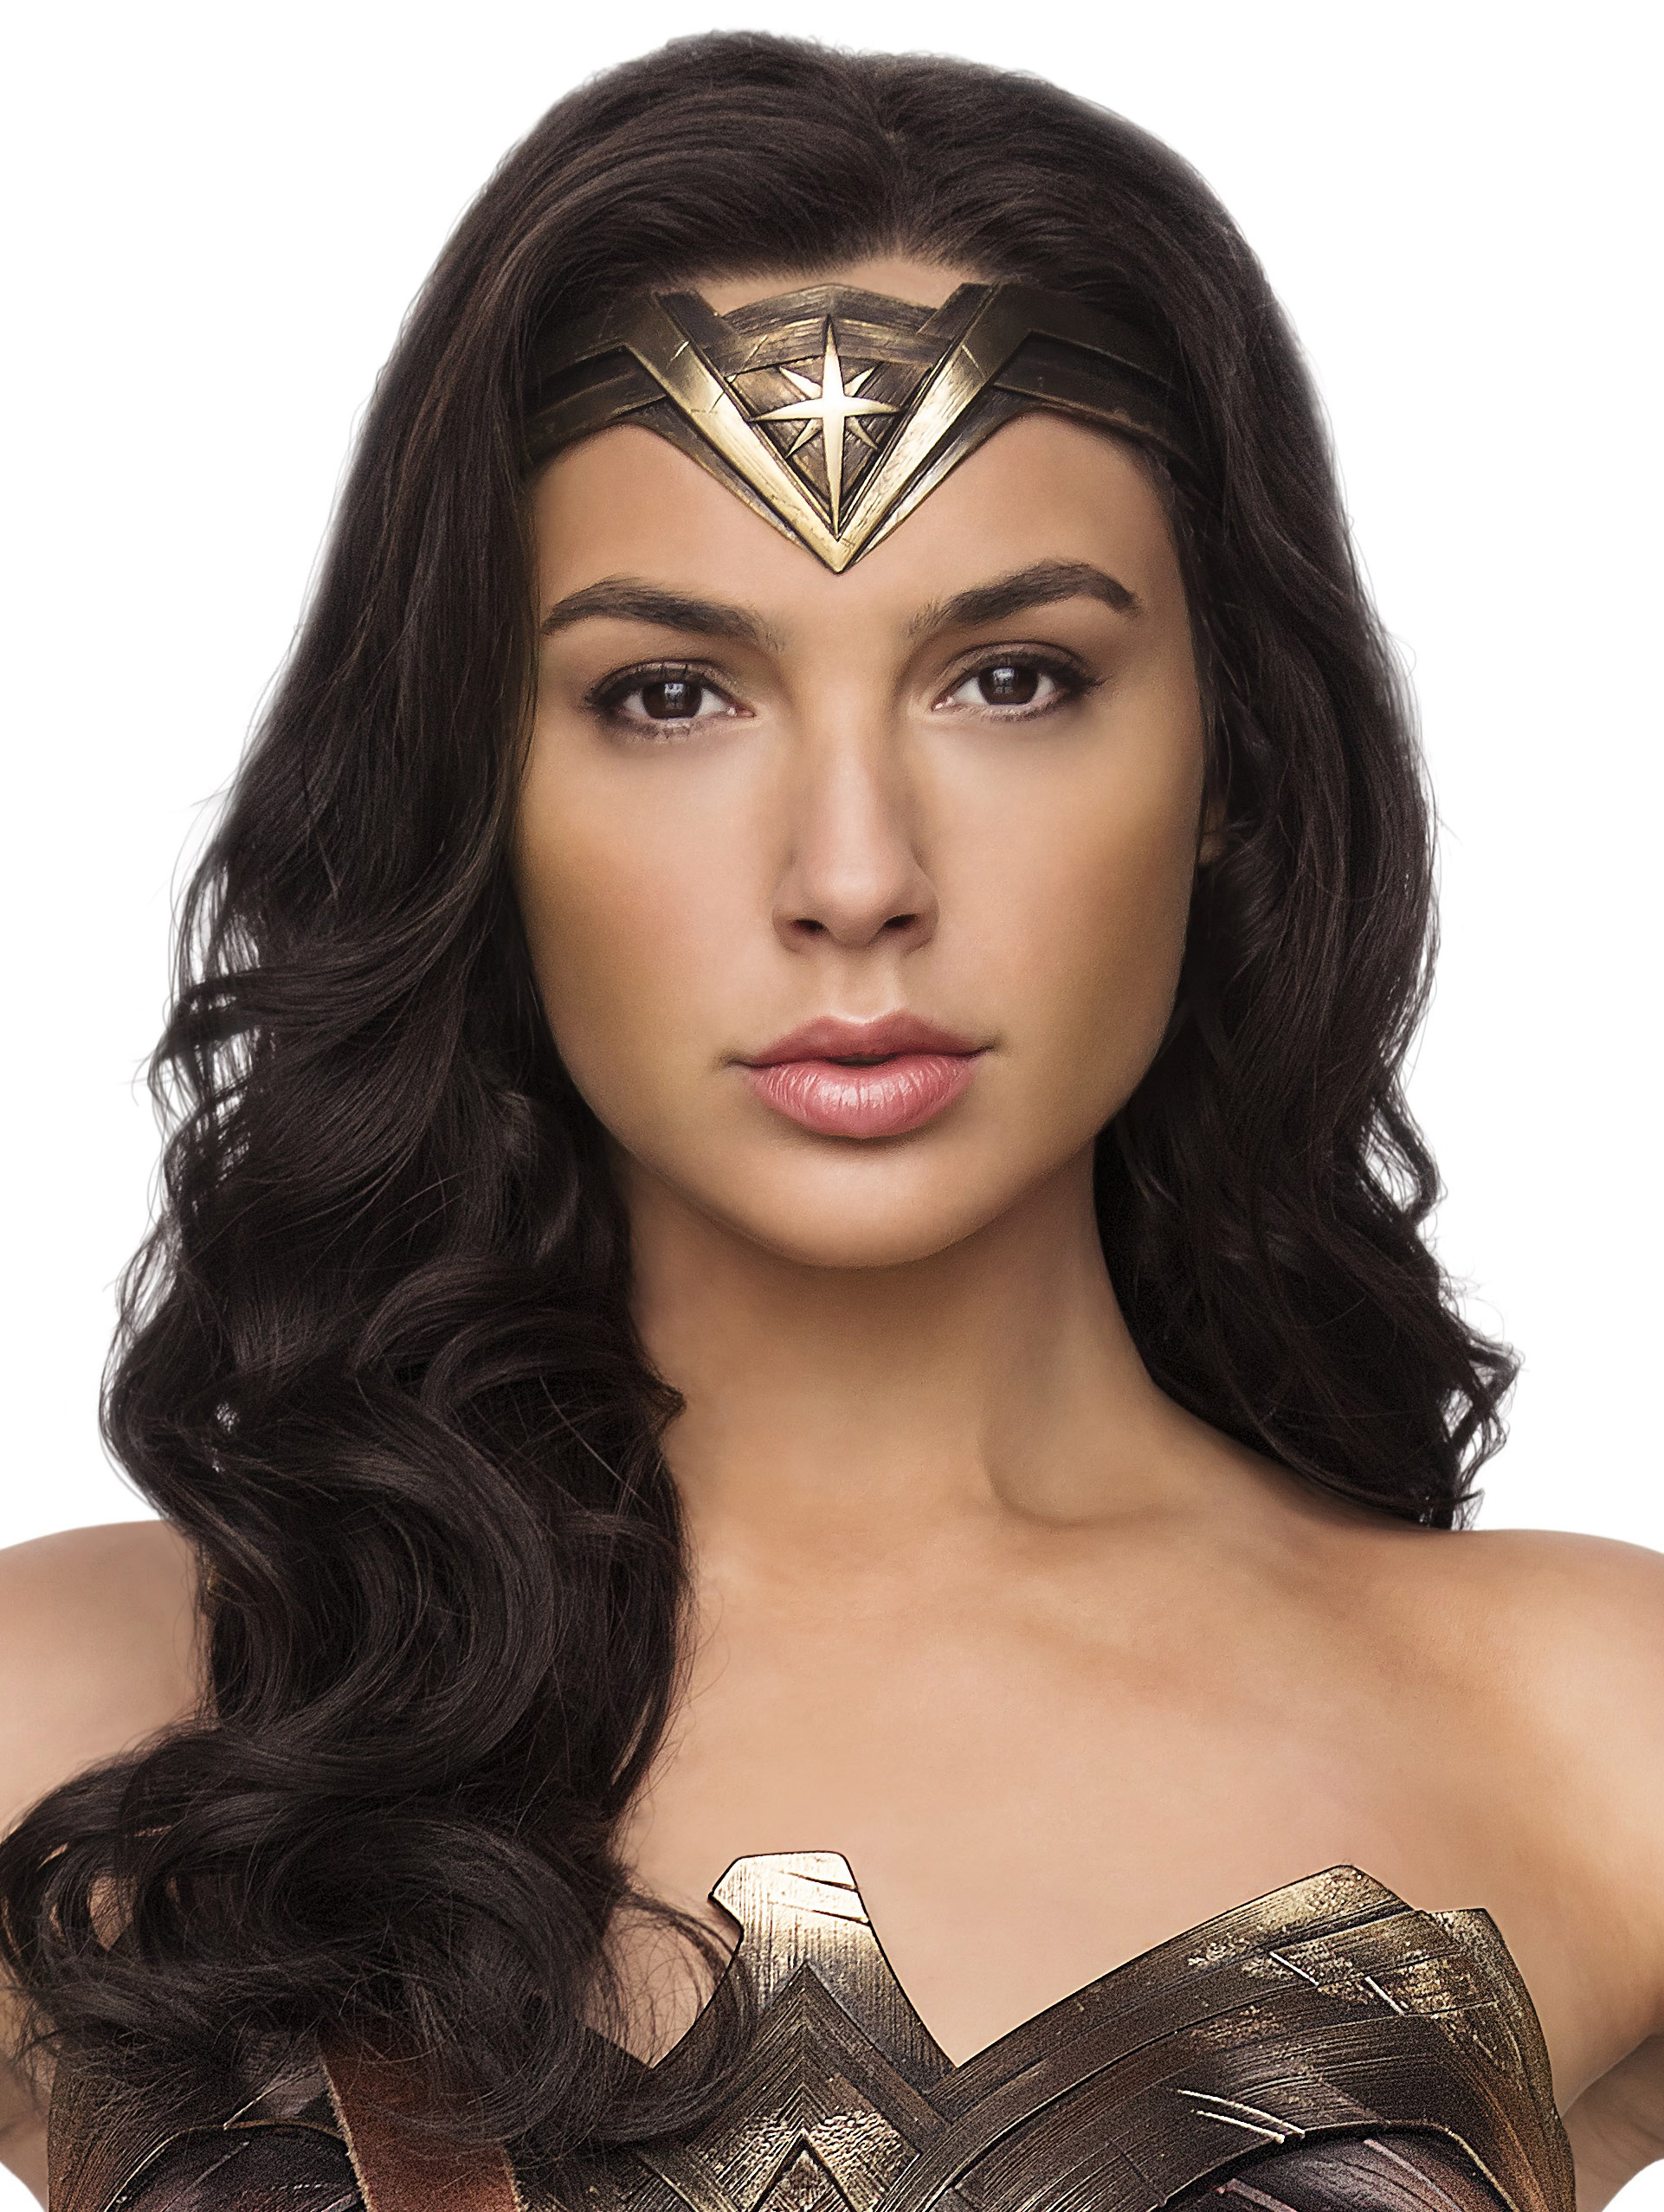 Diana Prince